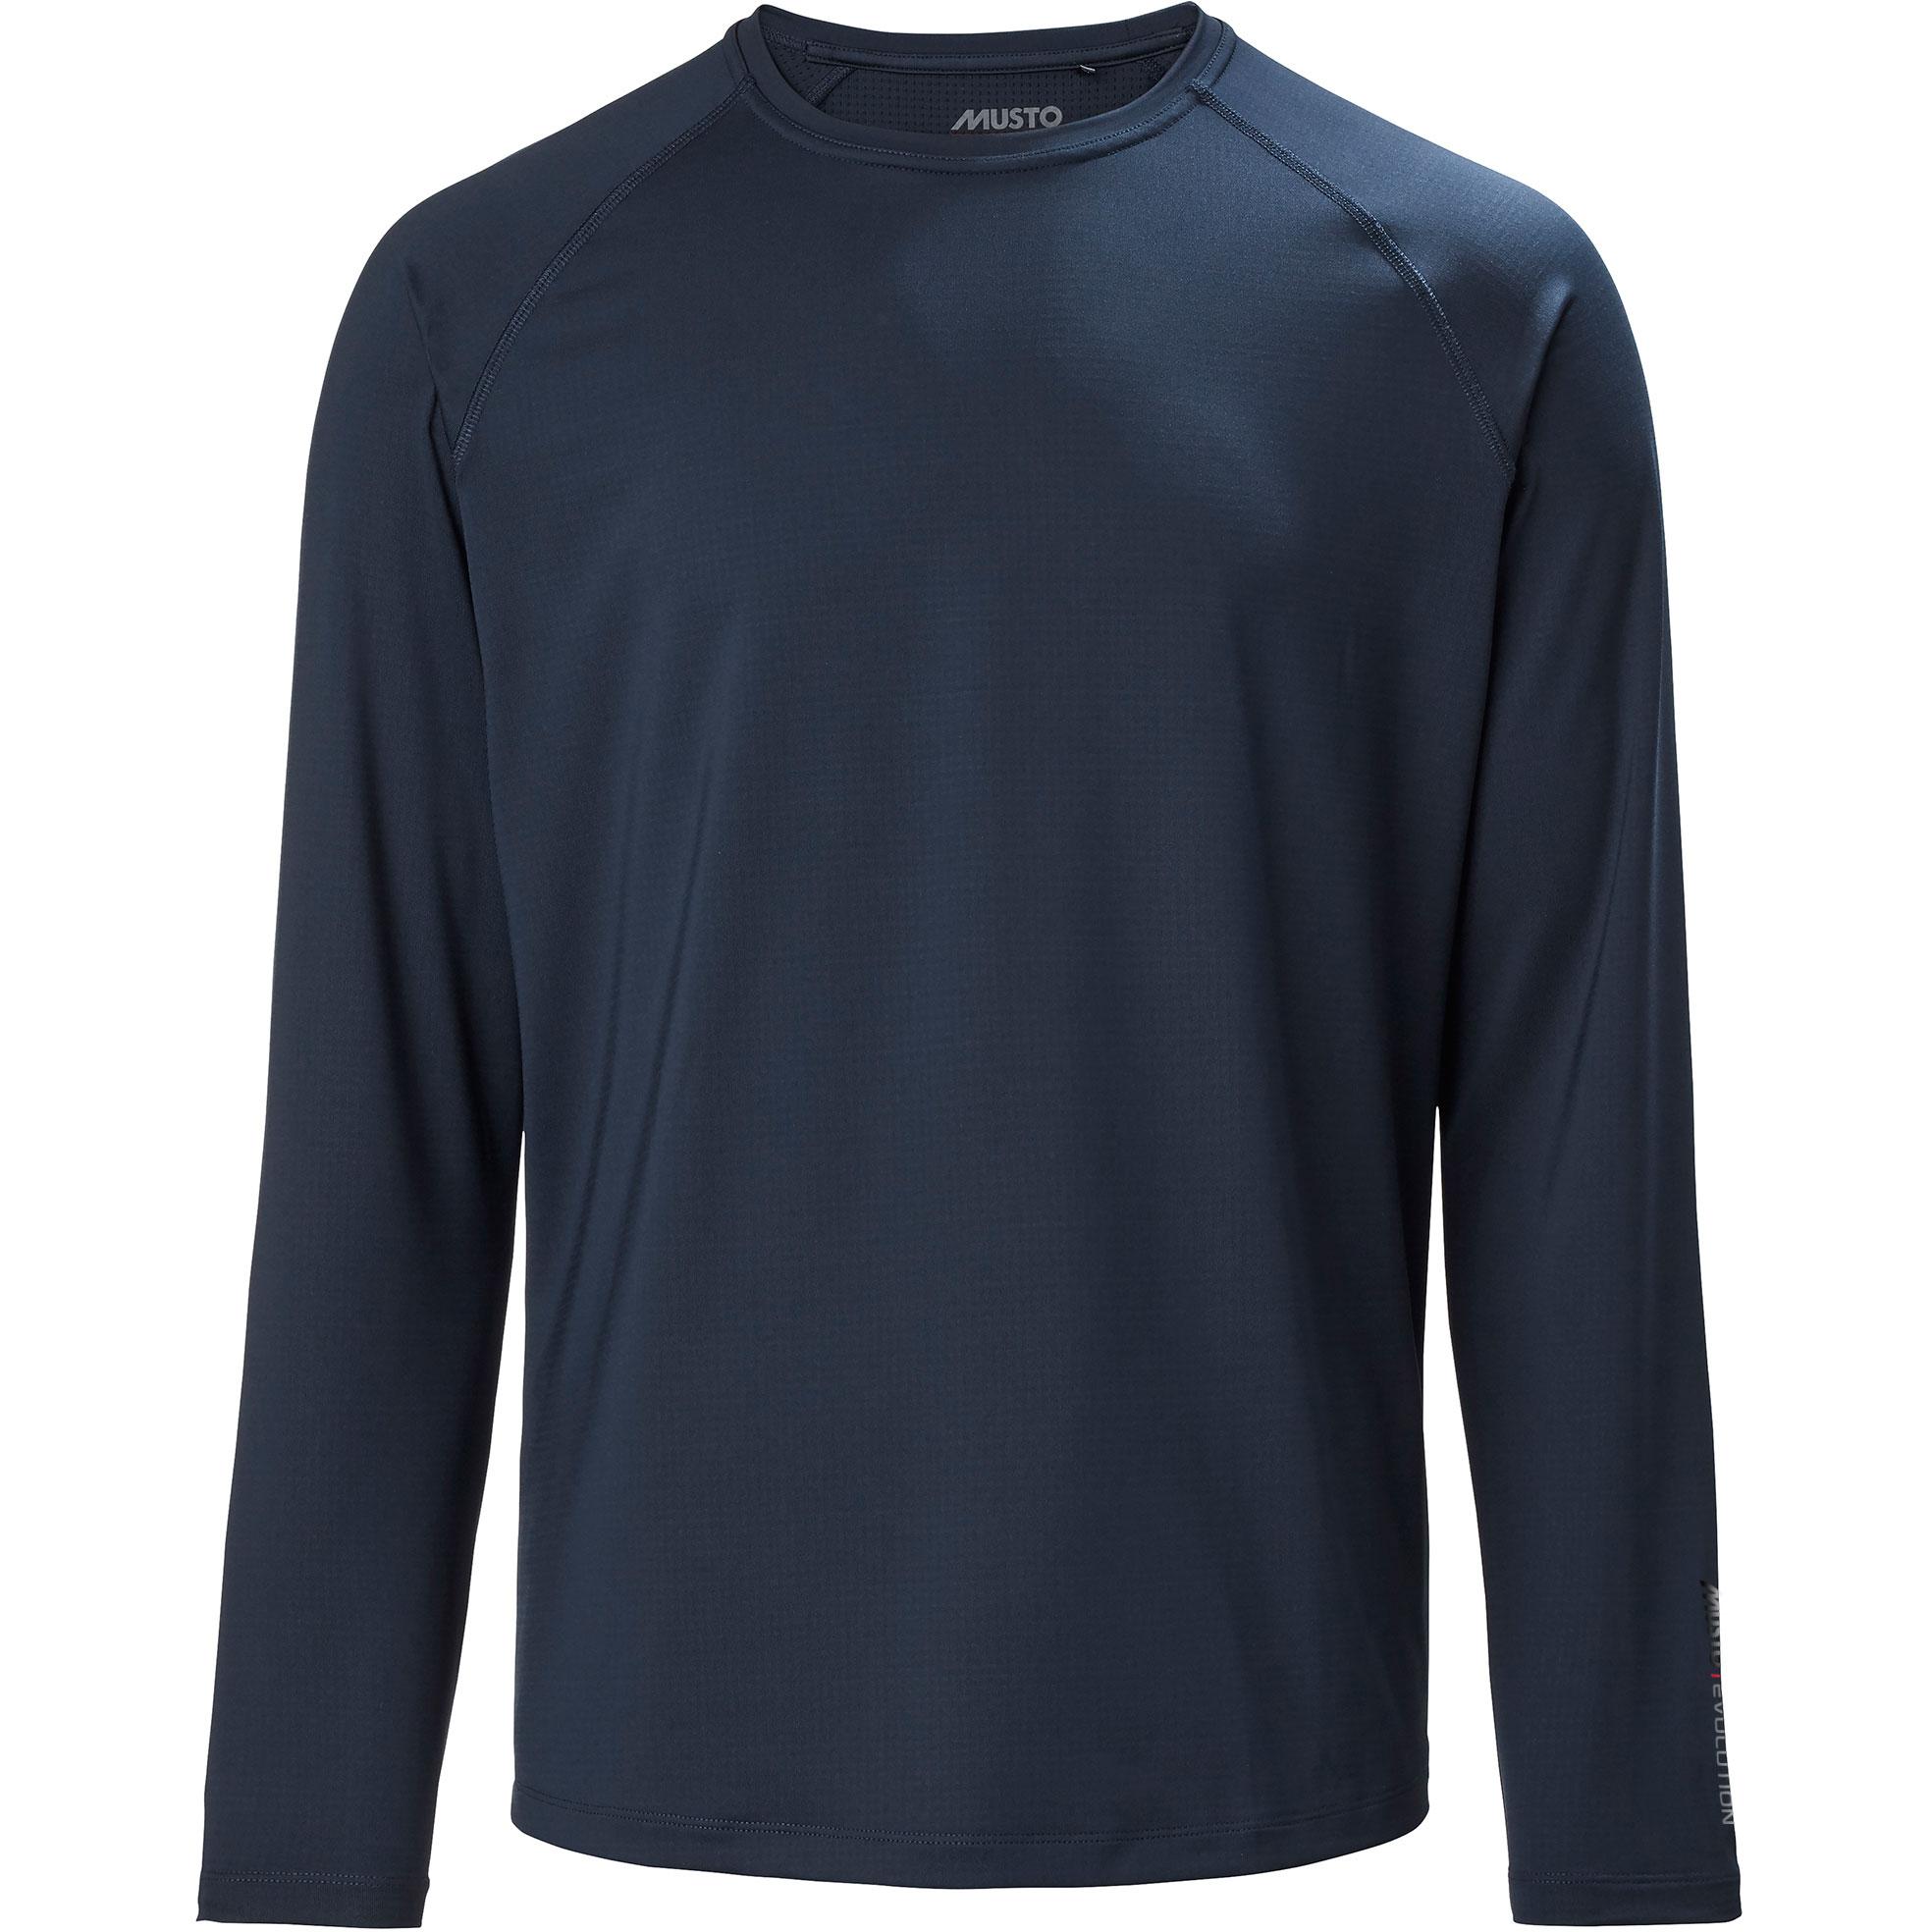 Respirant UPF40 Musto T-Shirt Manches Longues /à Manches Longues Sunblock Evolution Bleu Marine L/éger